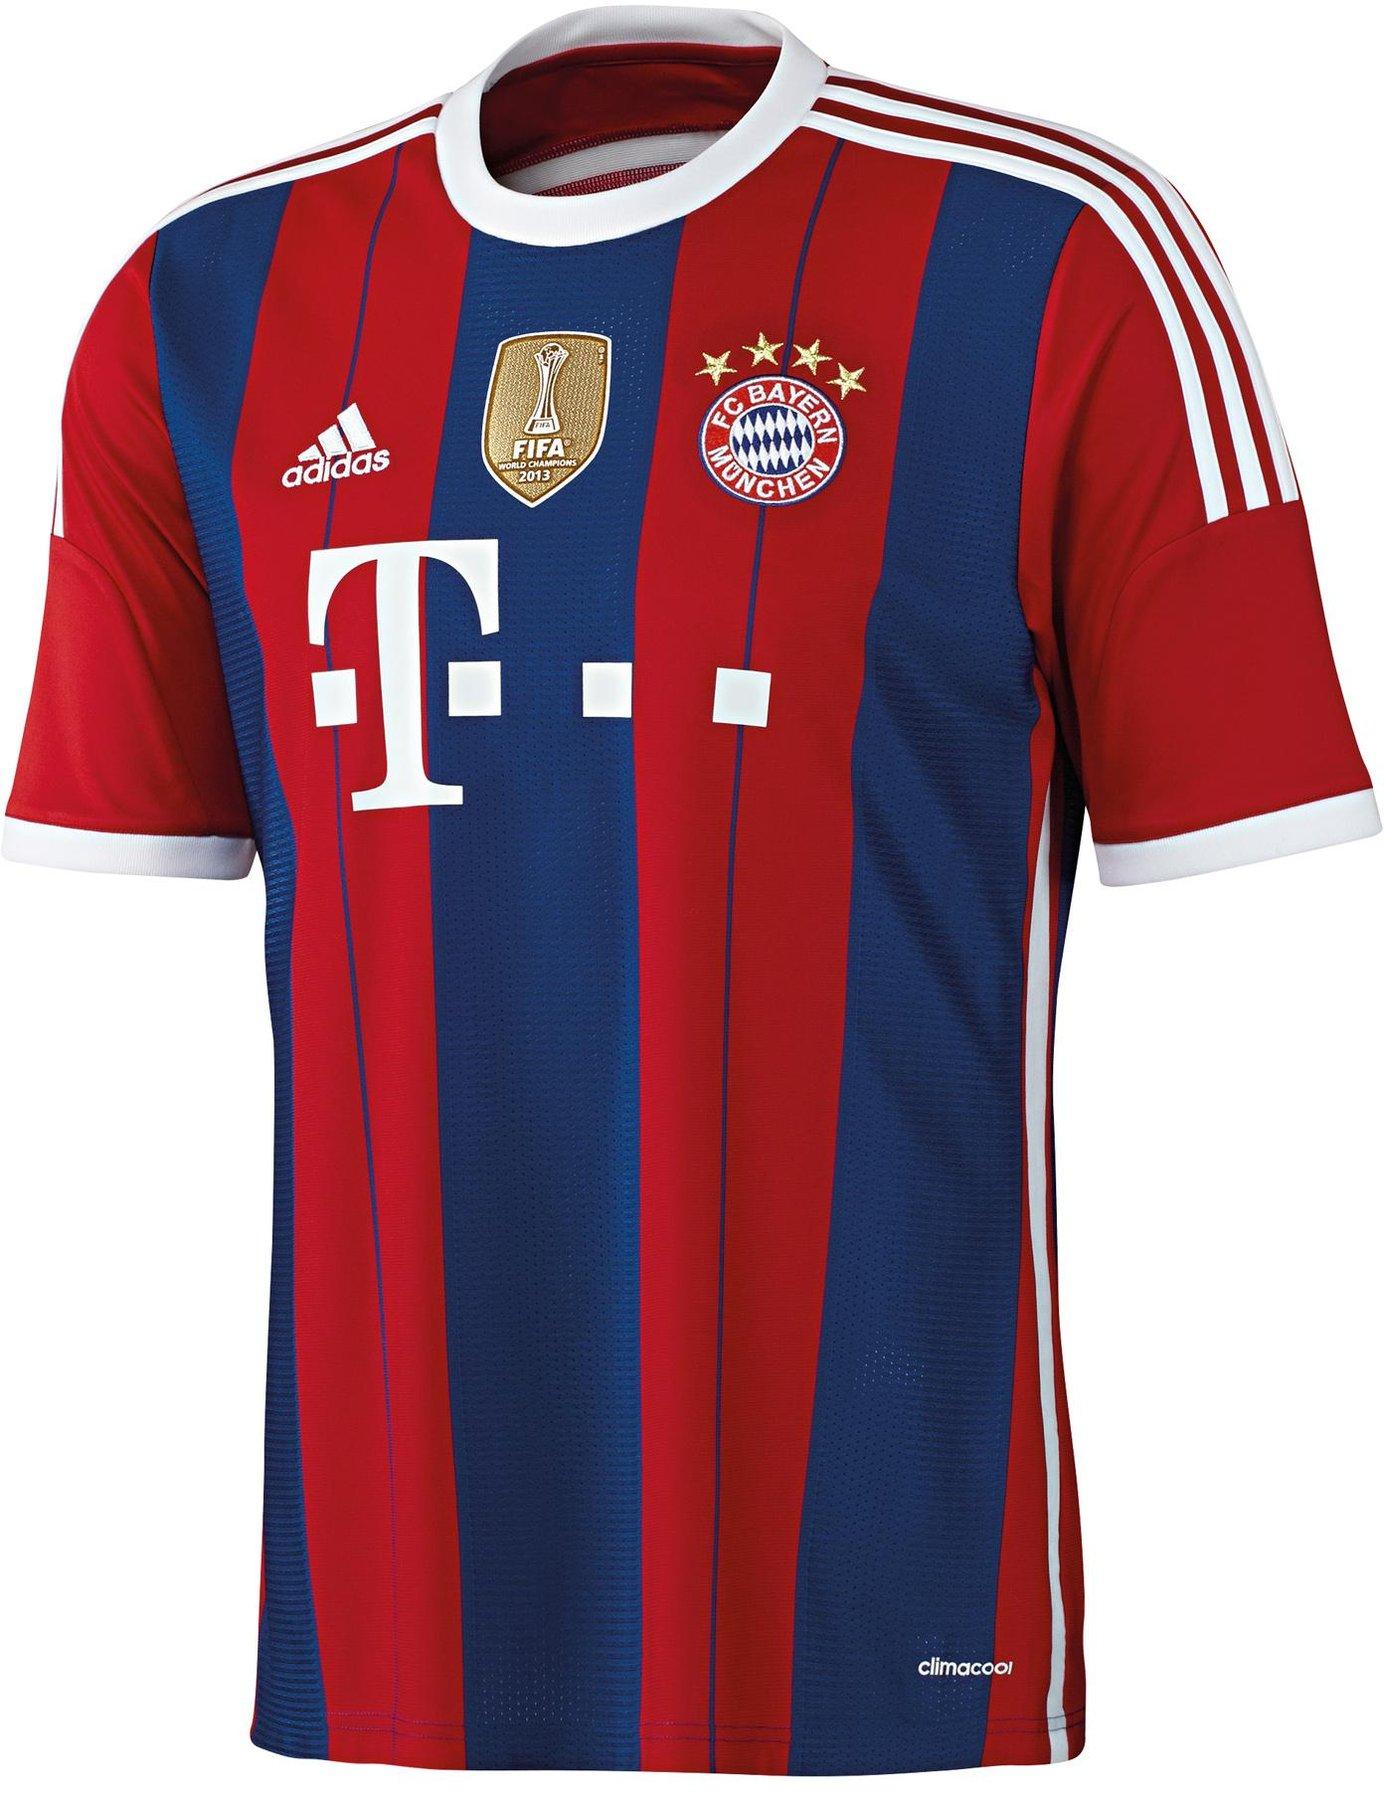 cc628cf29b Adidas FC Bayern München Home Trikot 2014/2015 günstig kaufen ✓